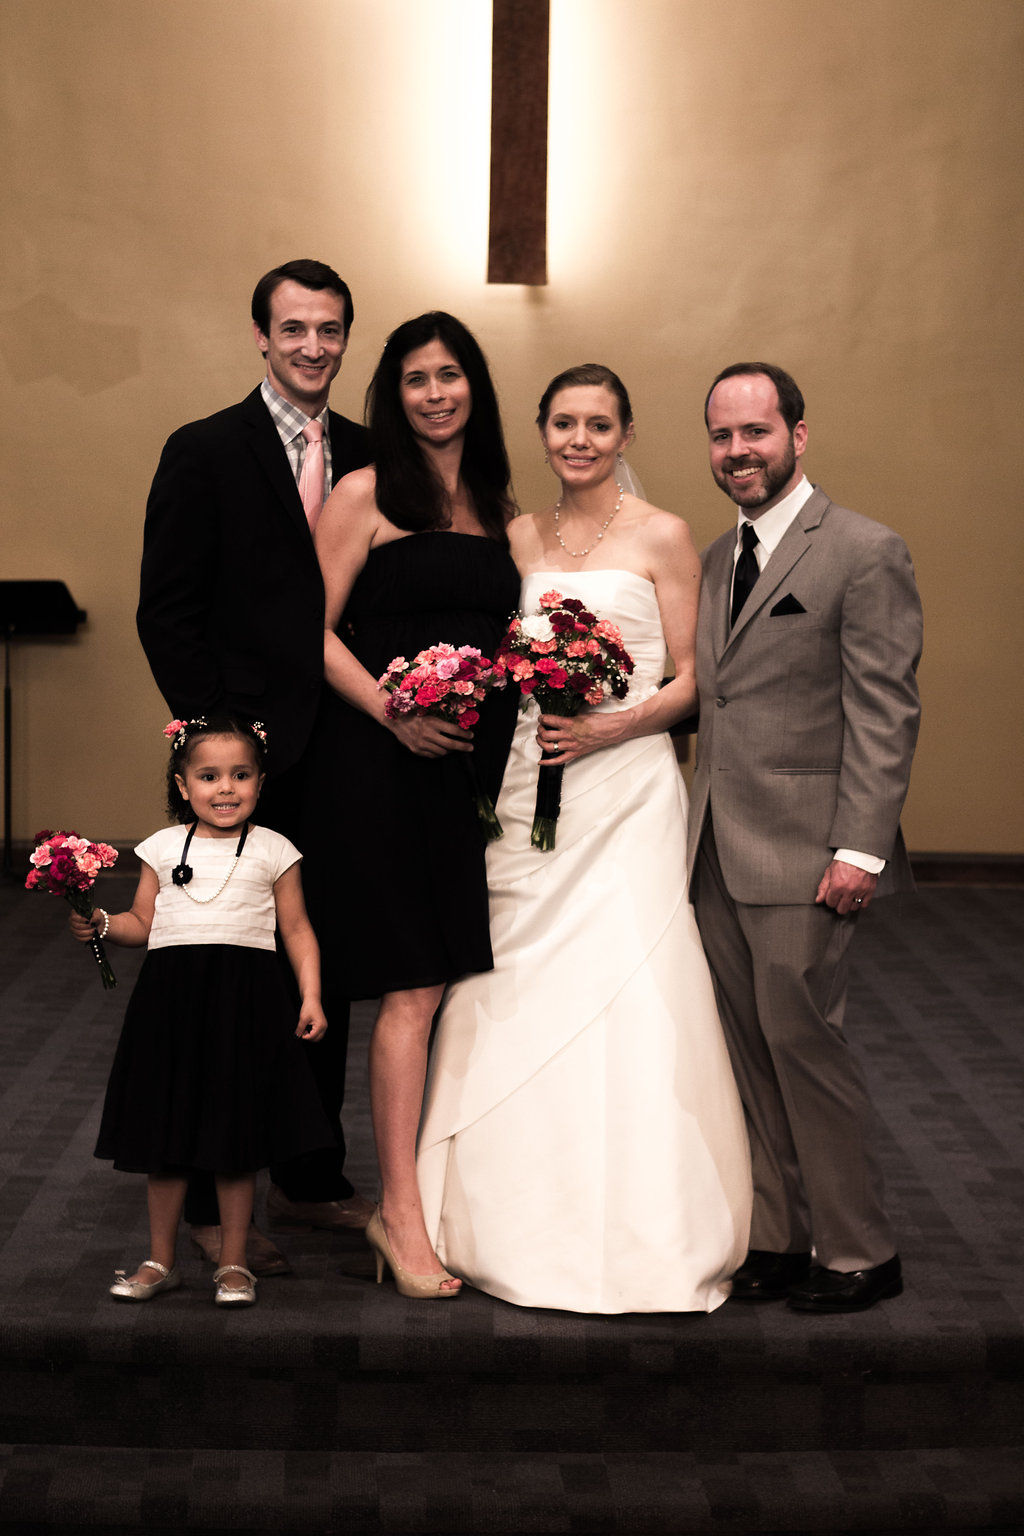 jakeandsuze_weddingselects-144.jpg